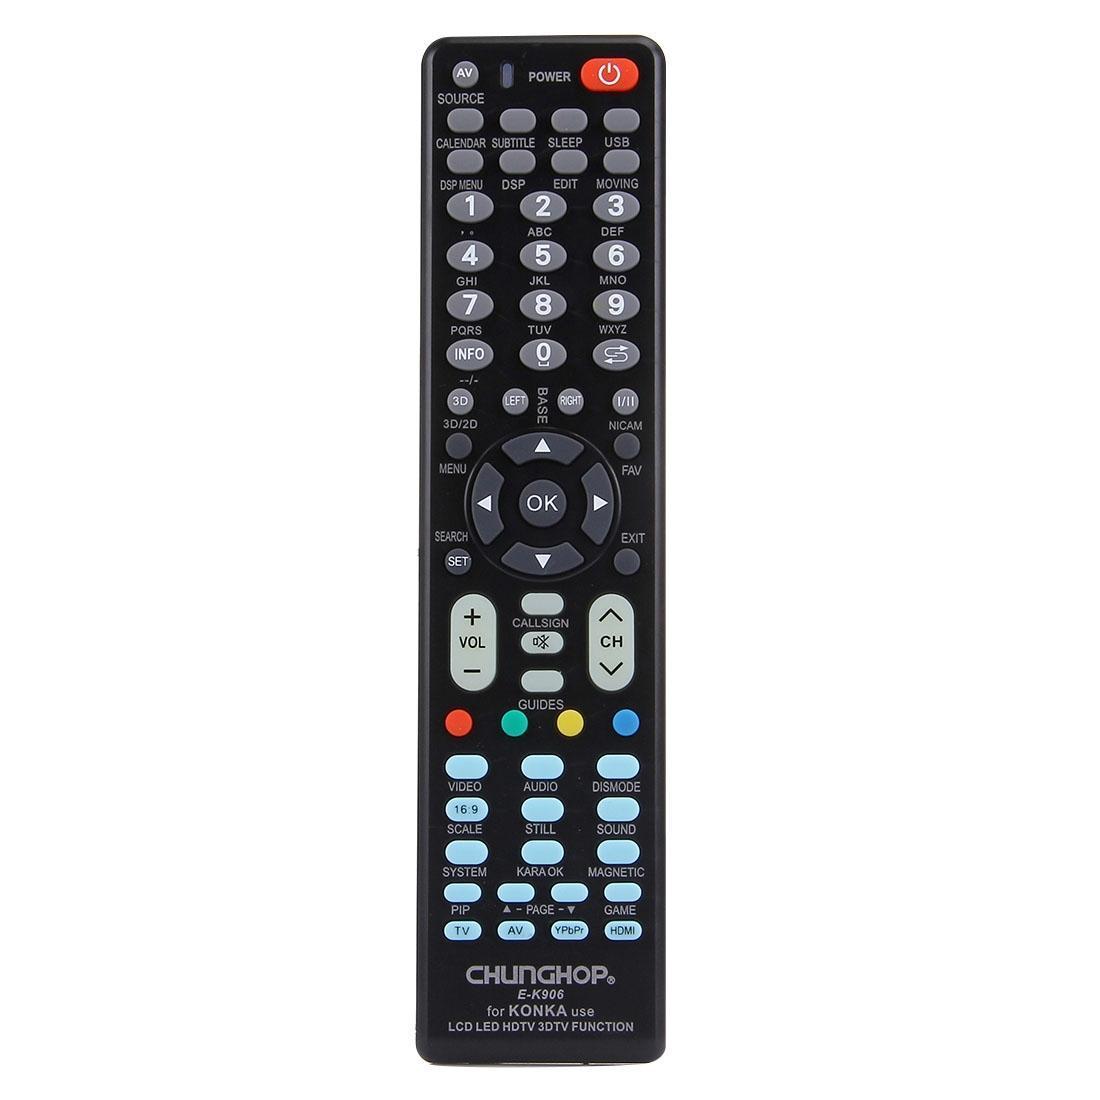 CHUNGHOP E-K906 Universal Remote Controller for KONKA LED TV / LCD TV / HDTV / 3DTV